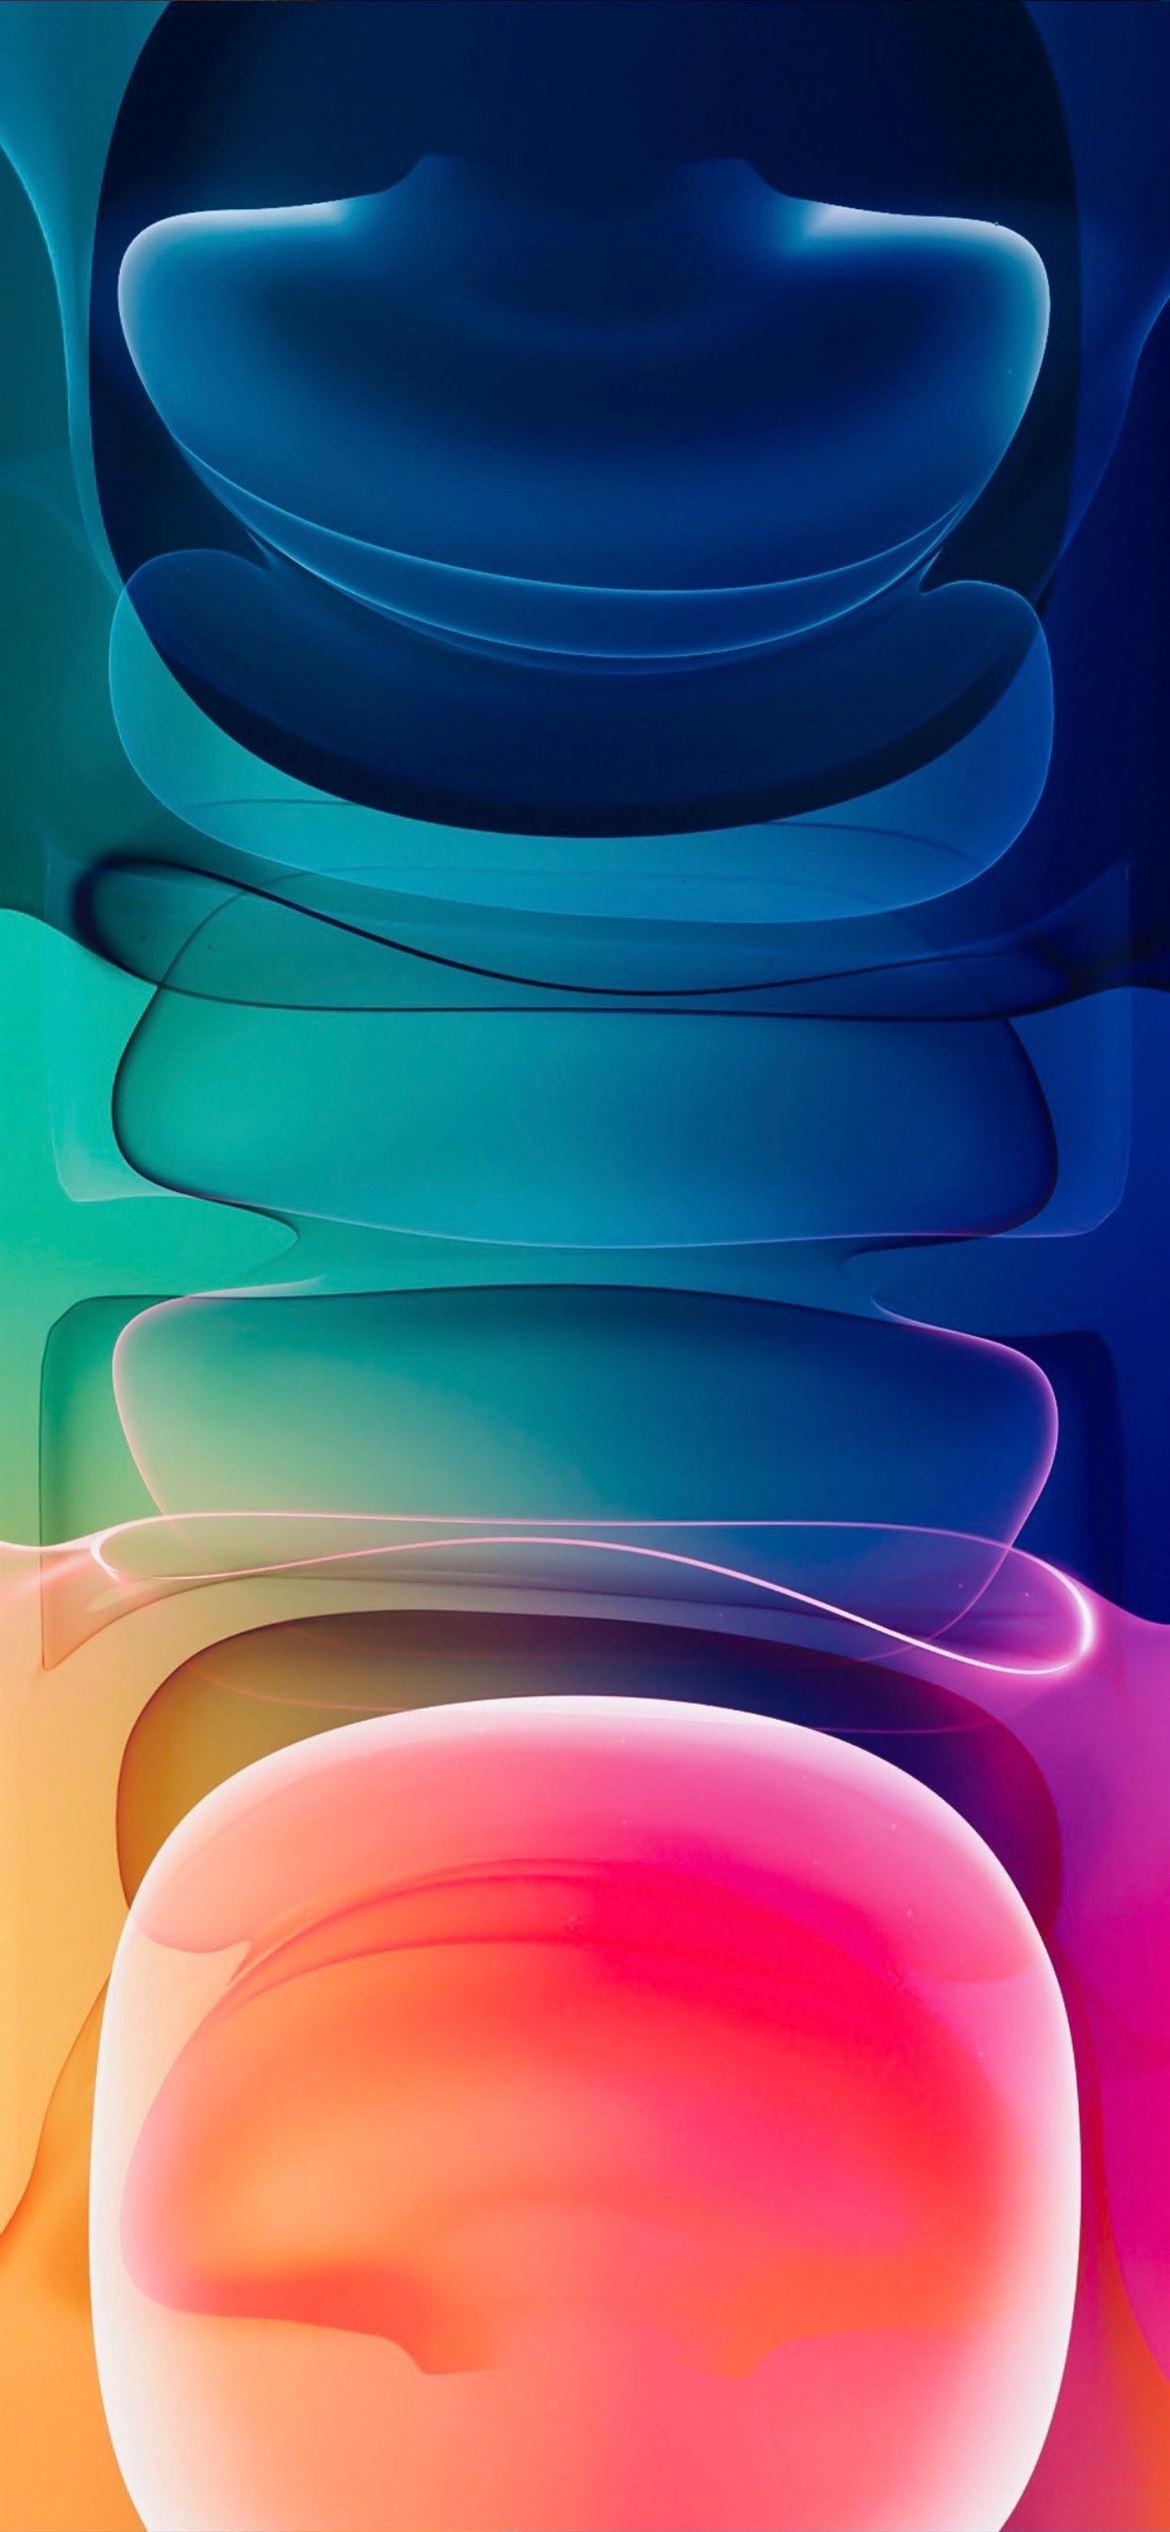 Best Aesthetic Iphone 12 Wallpapers Hd Ilikewallpaper